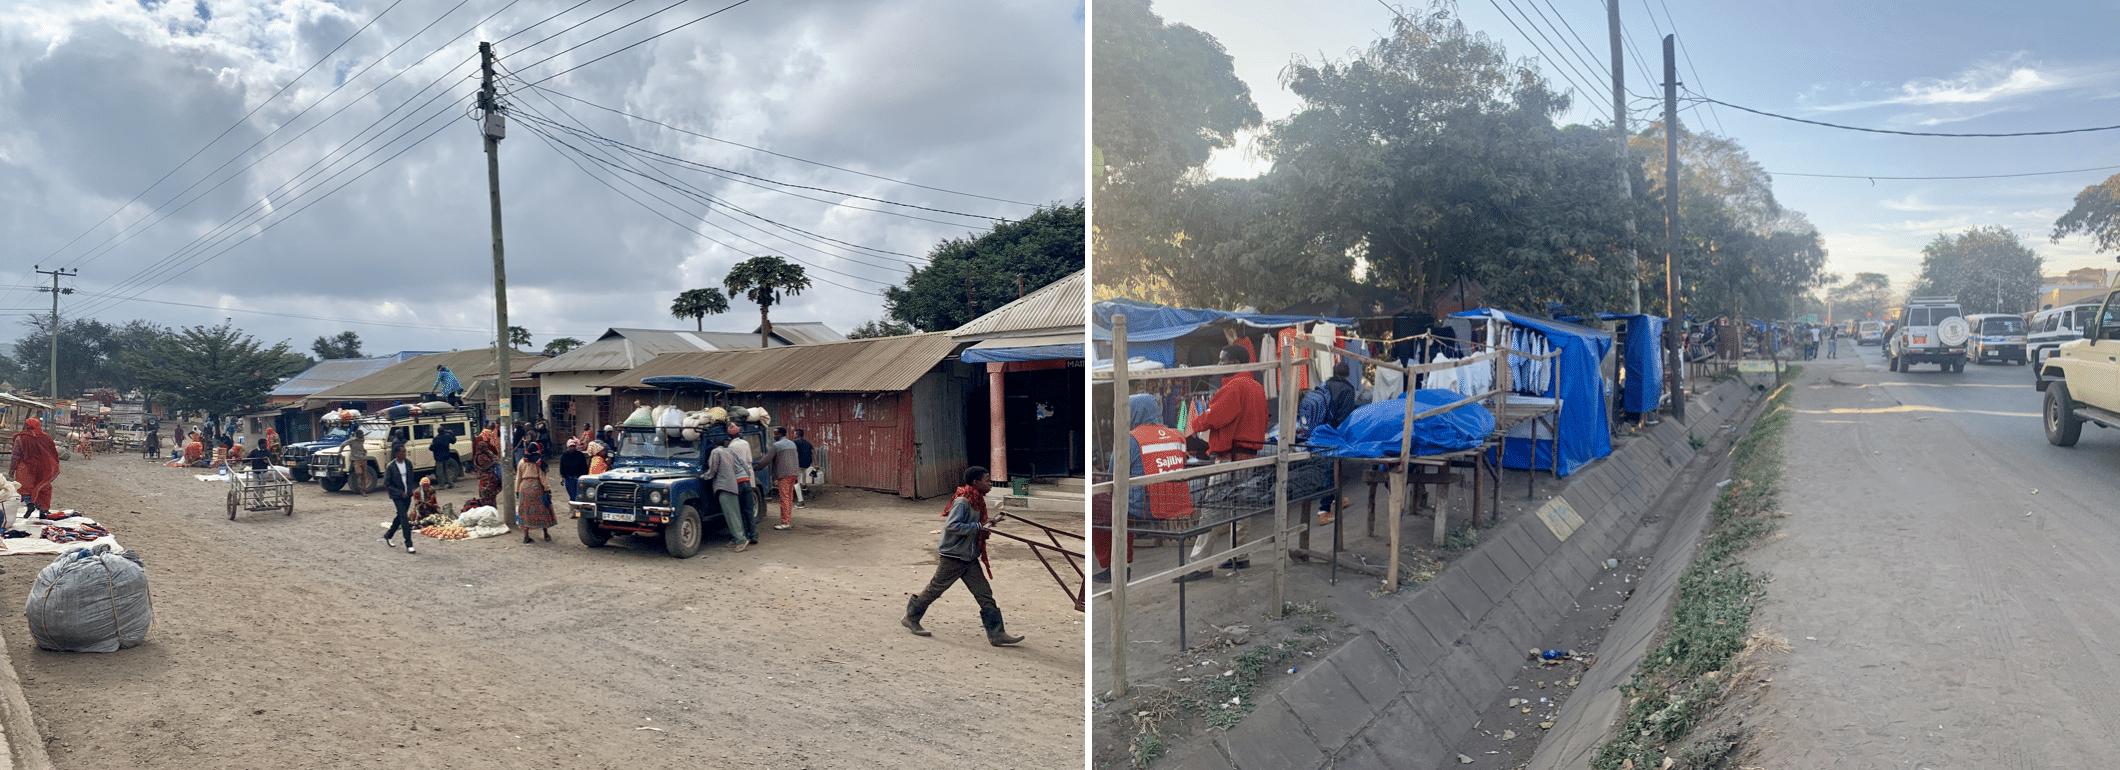 la ville d'arusha en tanzanie